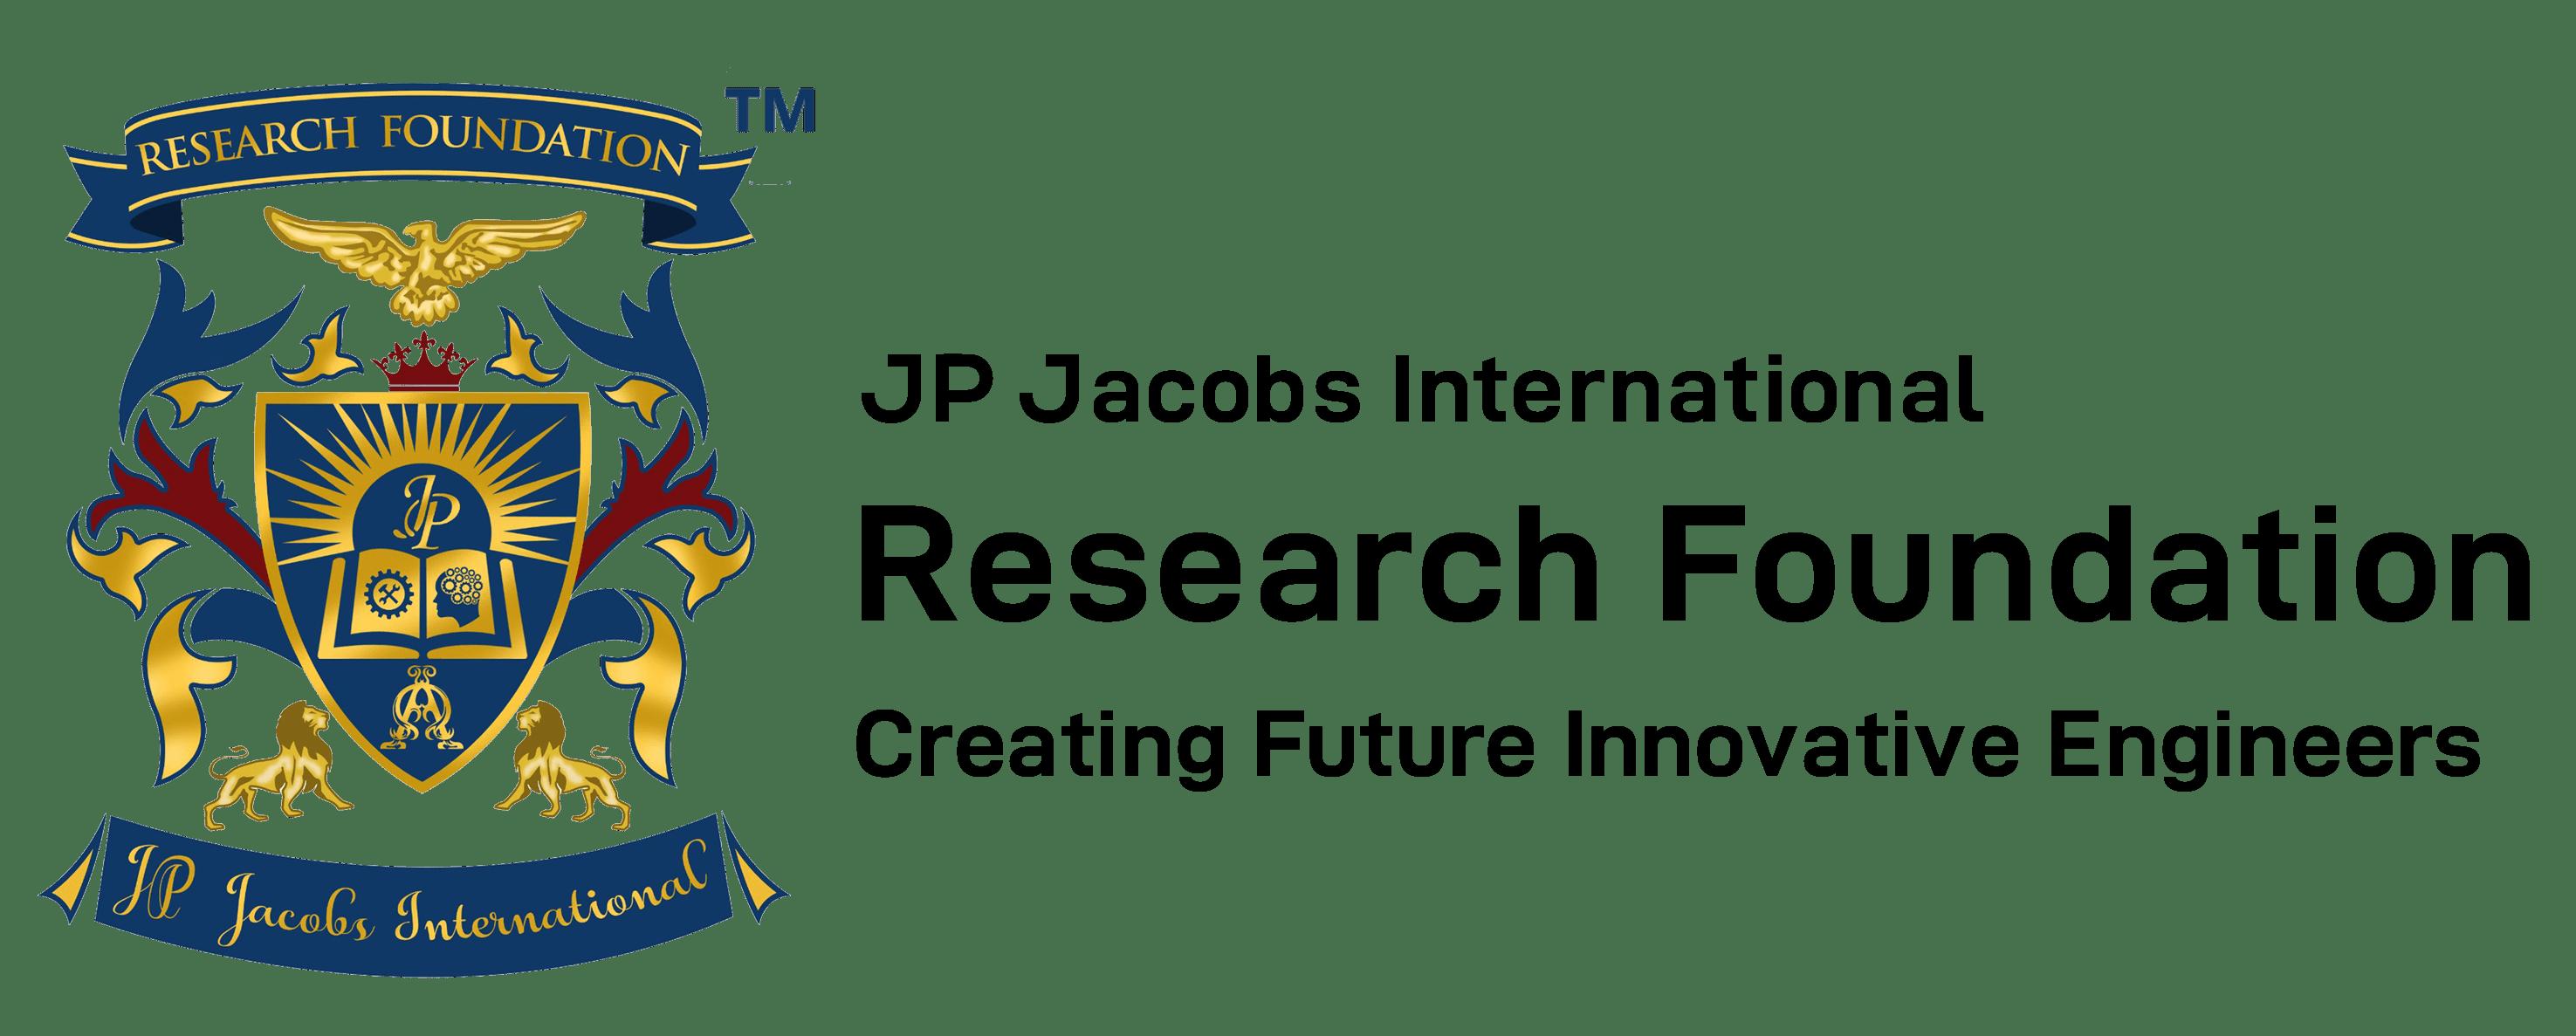 JP Jacobs International University